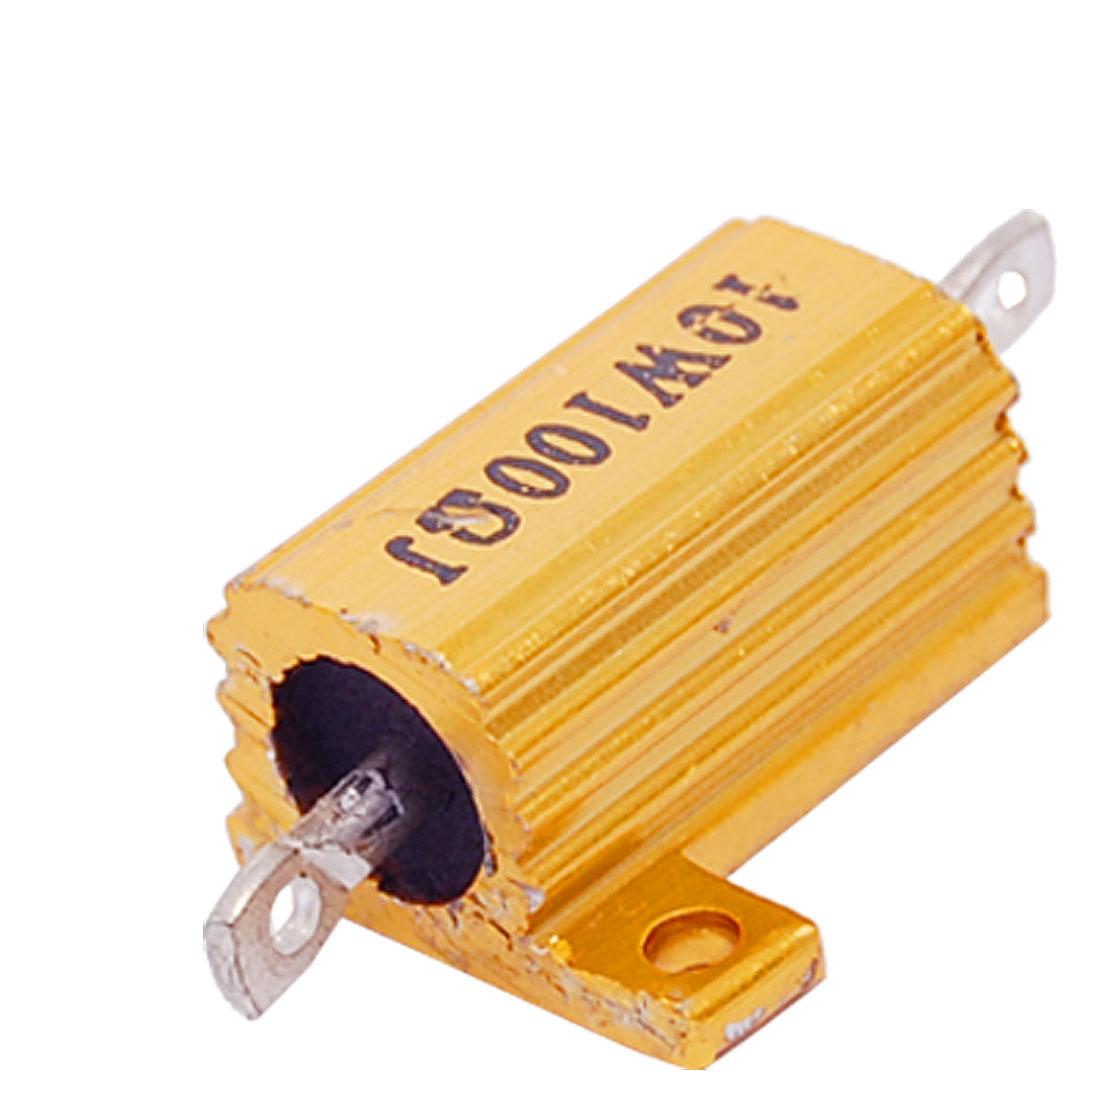 Gold Tone 10W 100Ohm 5% Aluminum Wirewound Resistor New